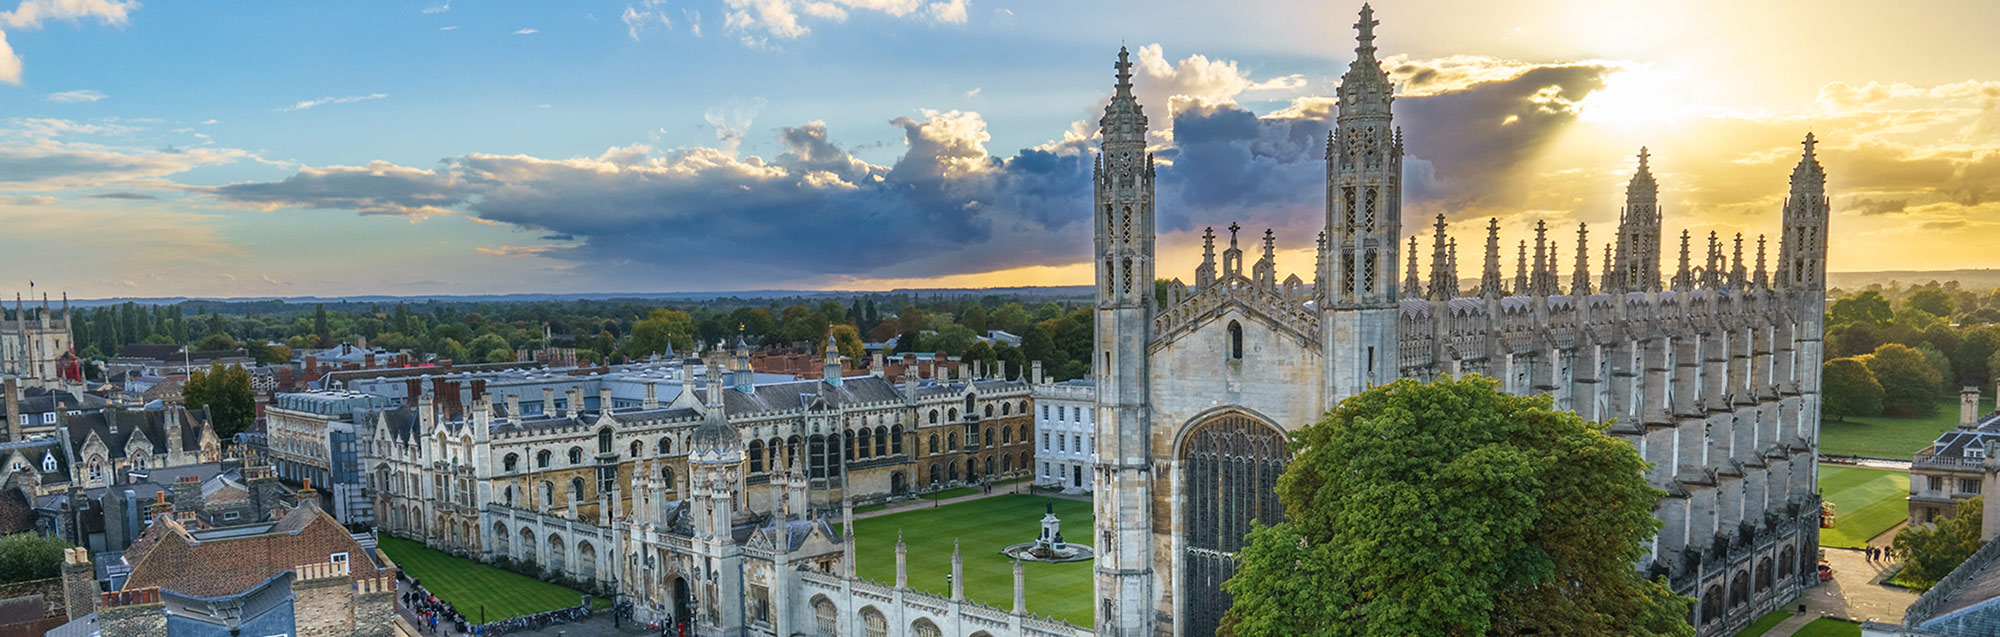 Vacanze studio di Inglese a Cambridge